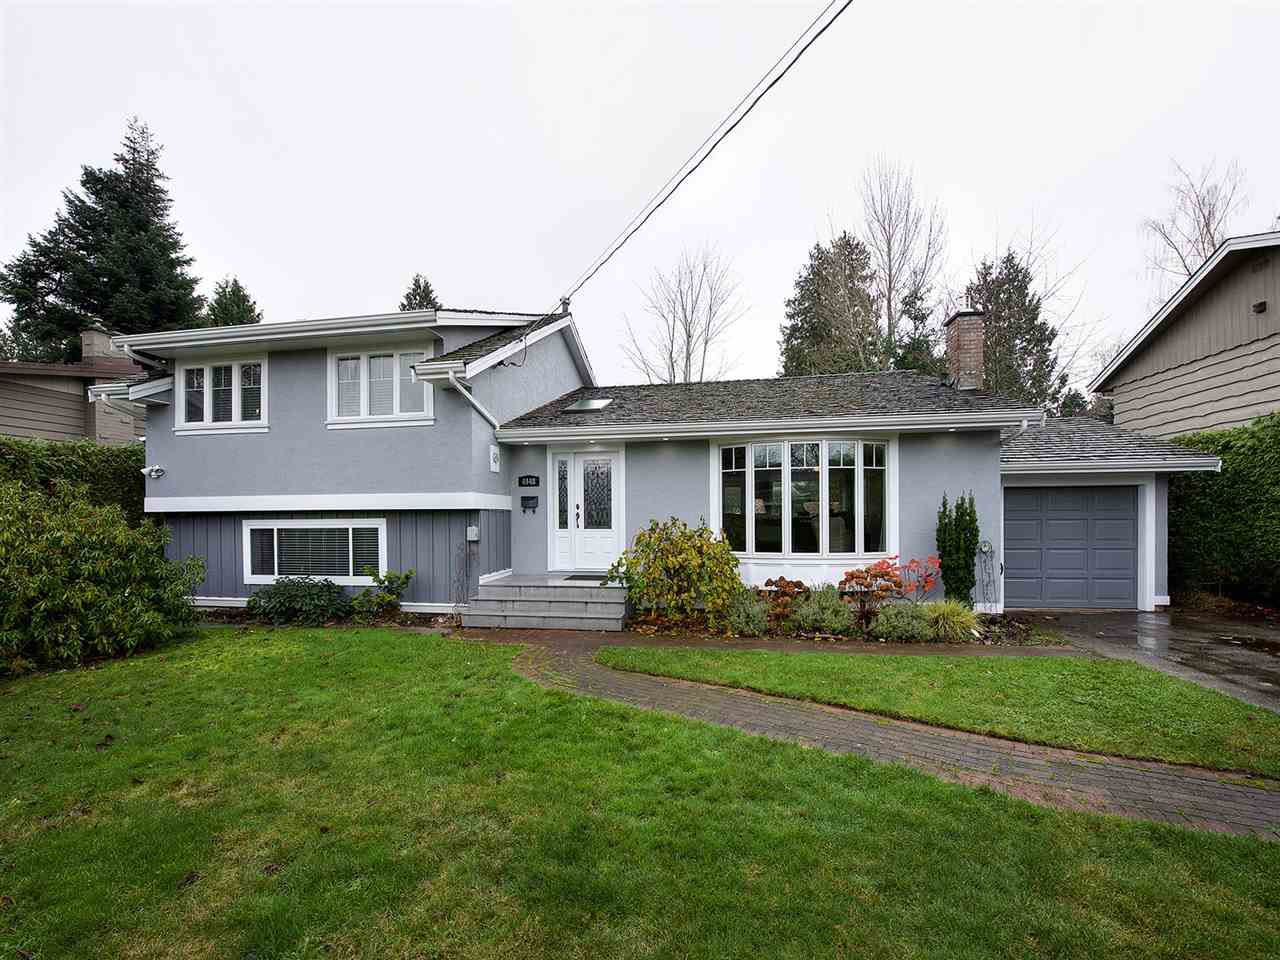 Main Photo: 4948 11A Avenue in Delta: Tsawwassen Central House for sale (Tsawwassen)  : MLS®# R2125963